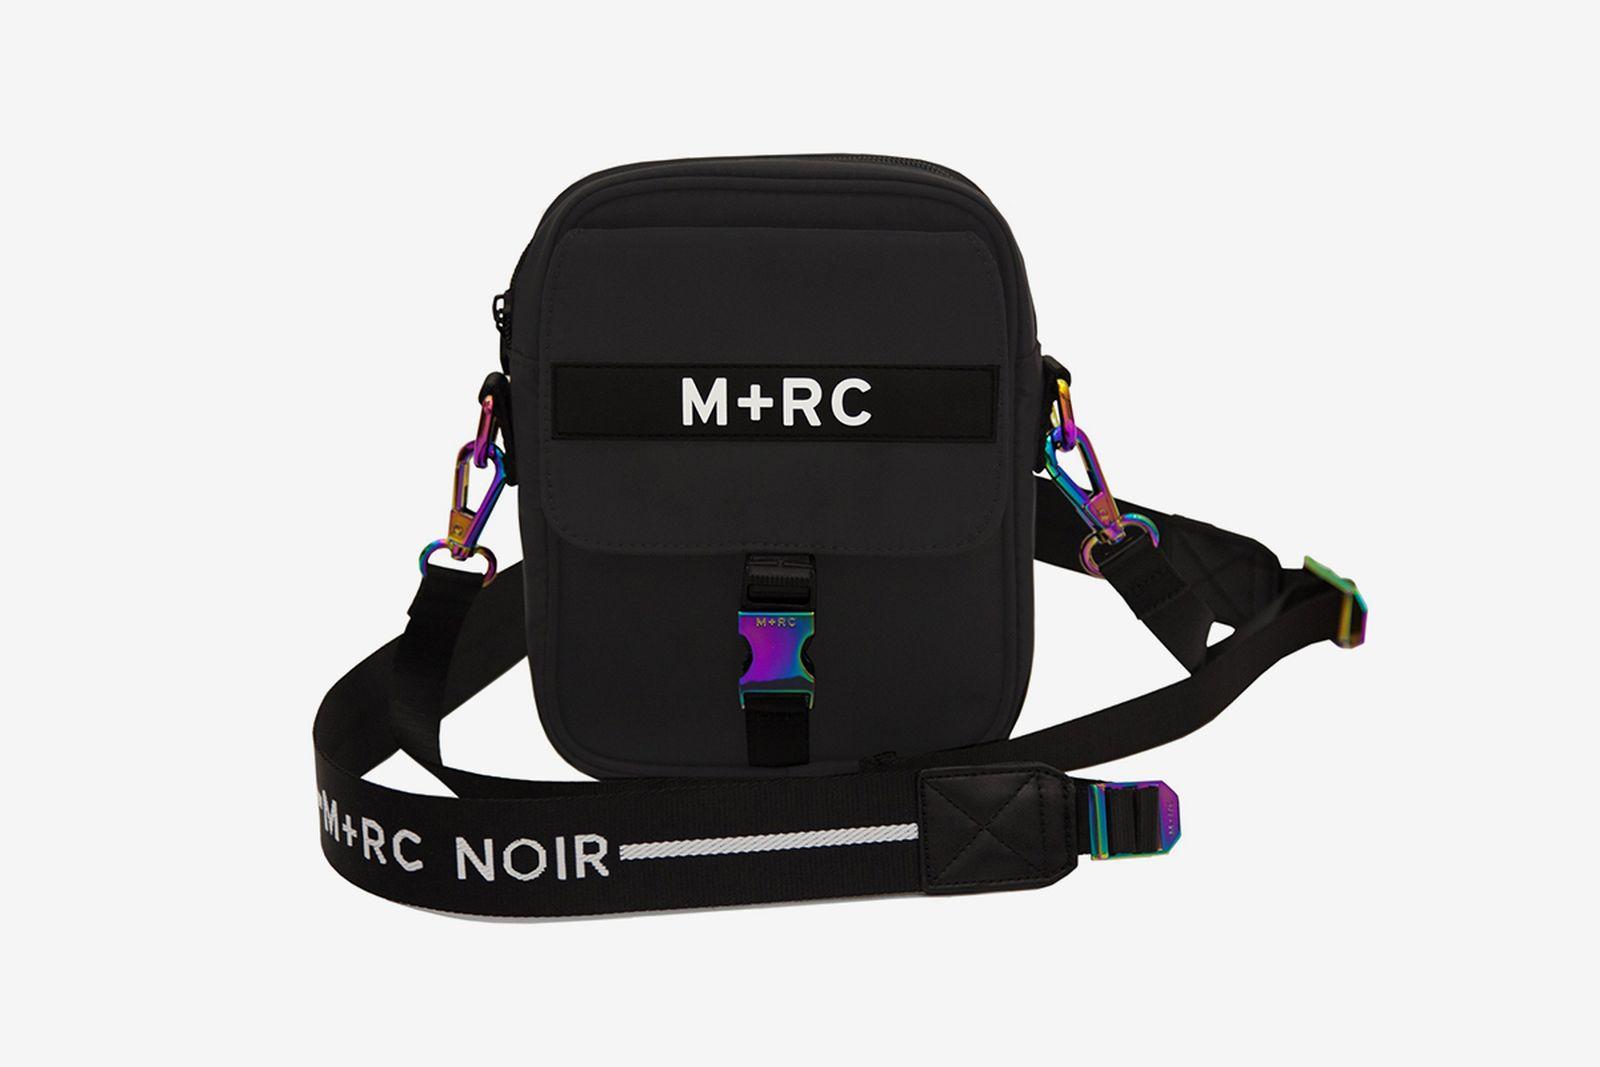 grey bet bag new M RC NOIR MRCNOIR 2048x2048 M+RC NOIR SS18 playboi carti